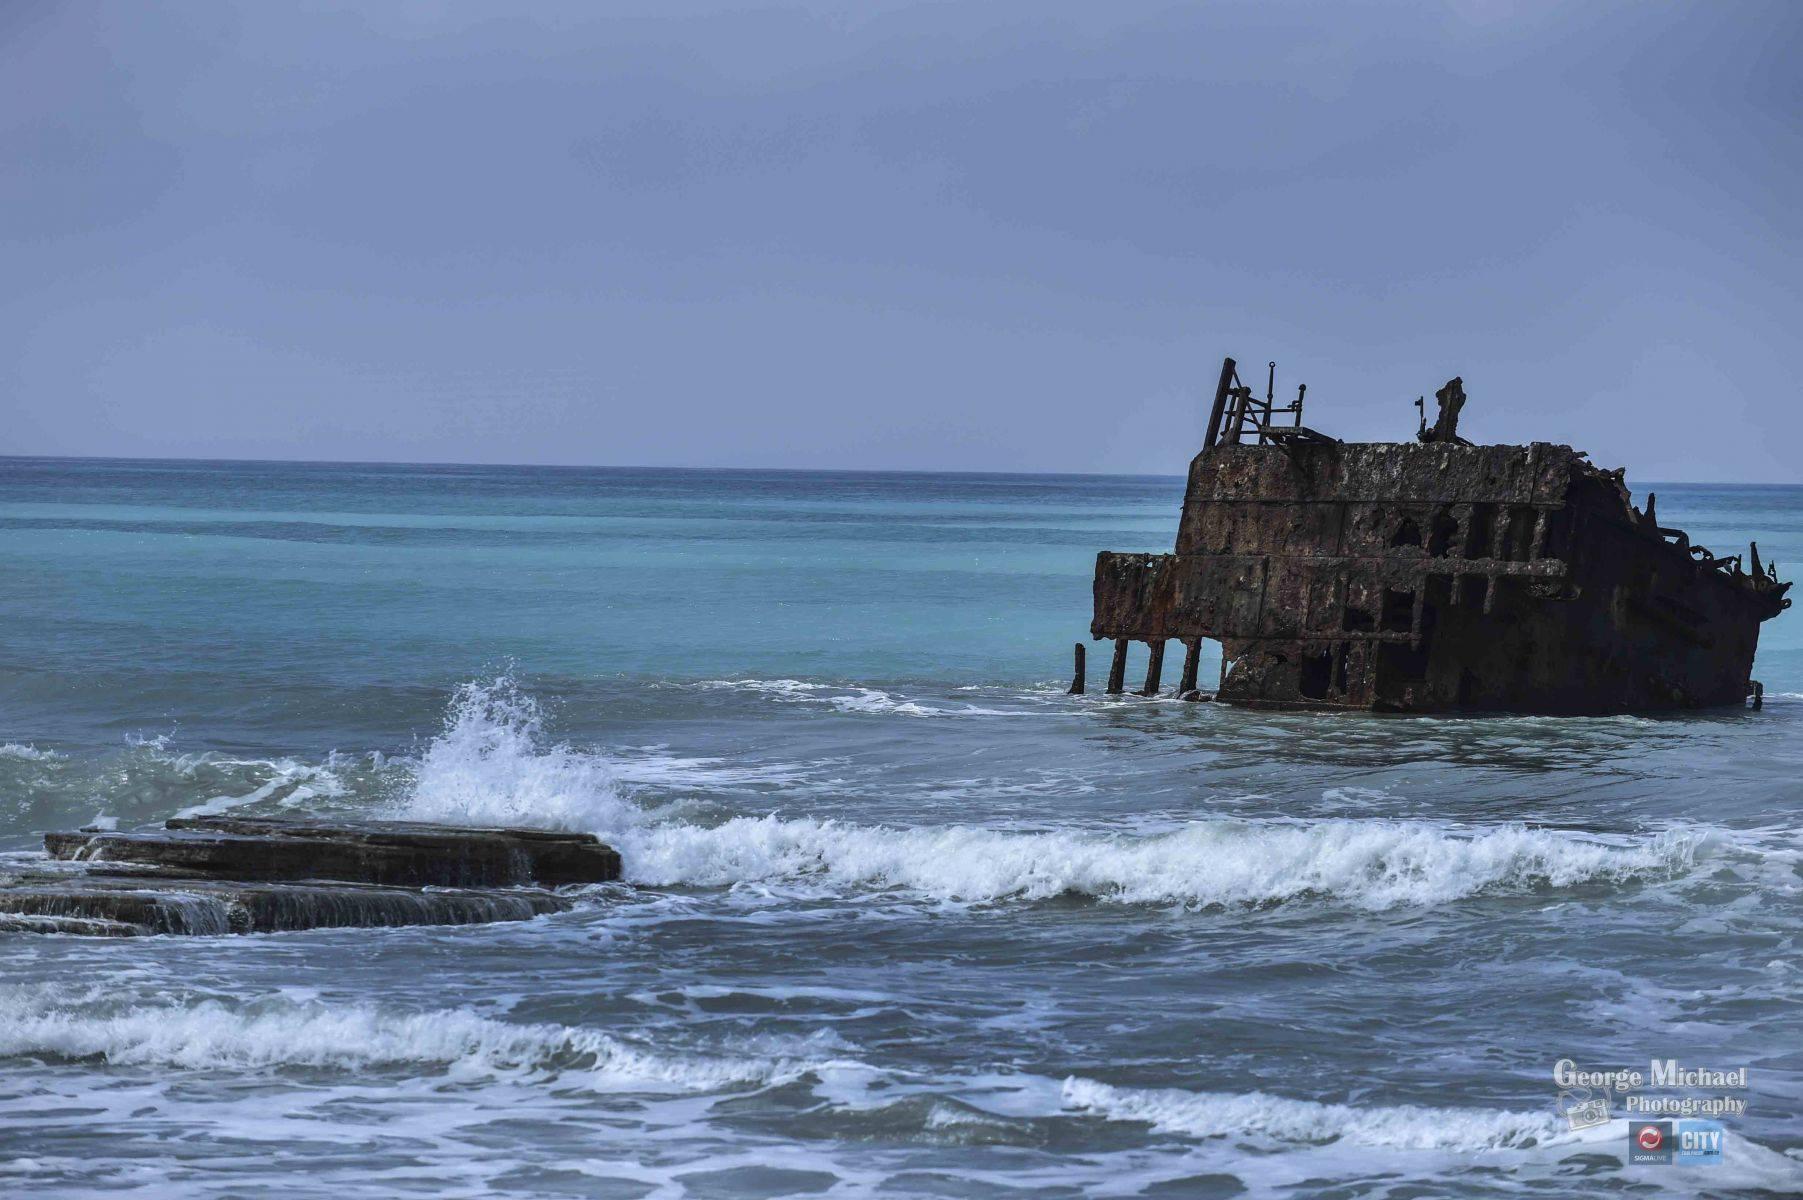 acrotiri shipwreck quad safari Limassol Cyprus Atlas rentals